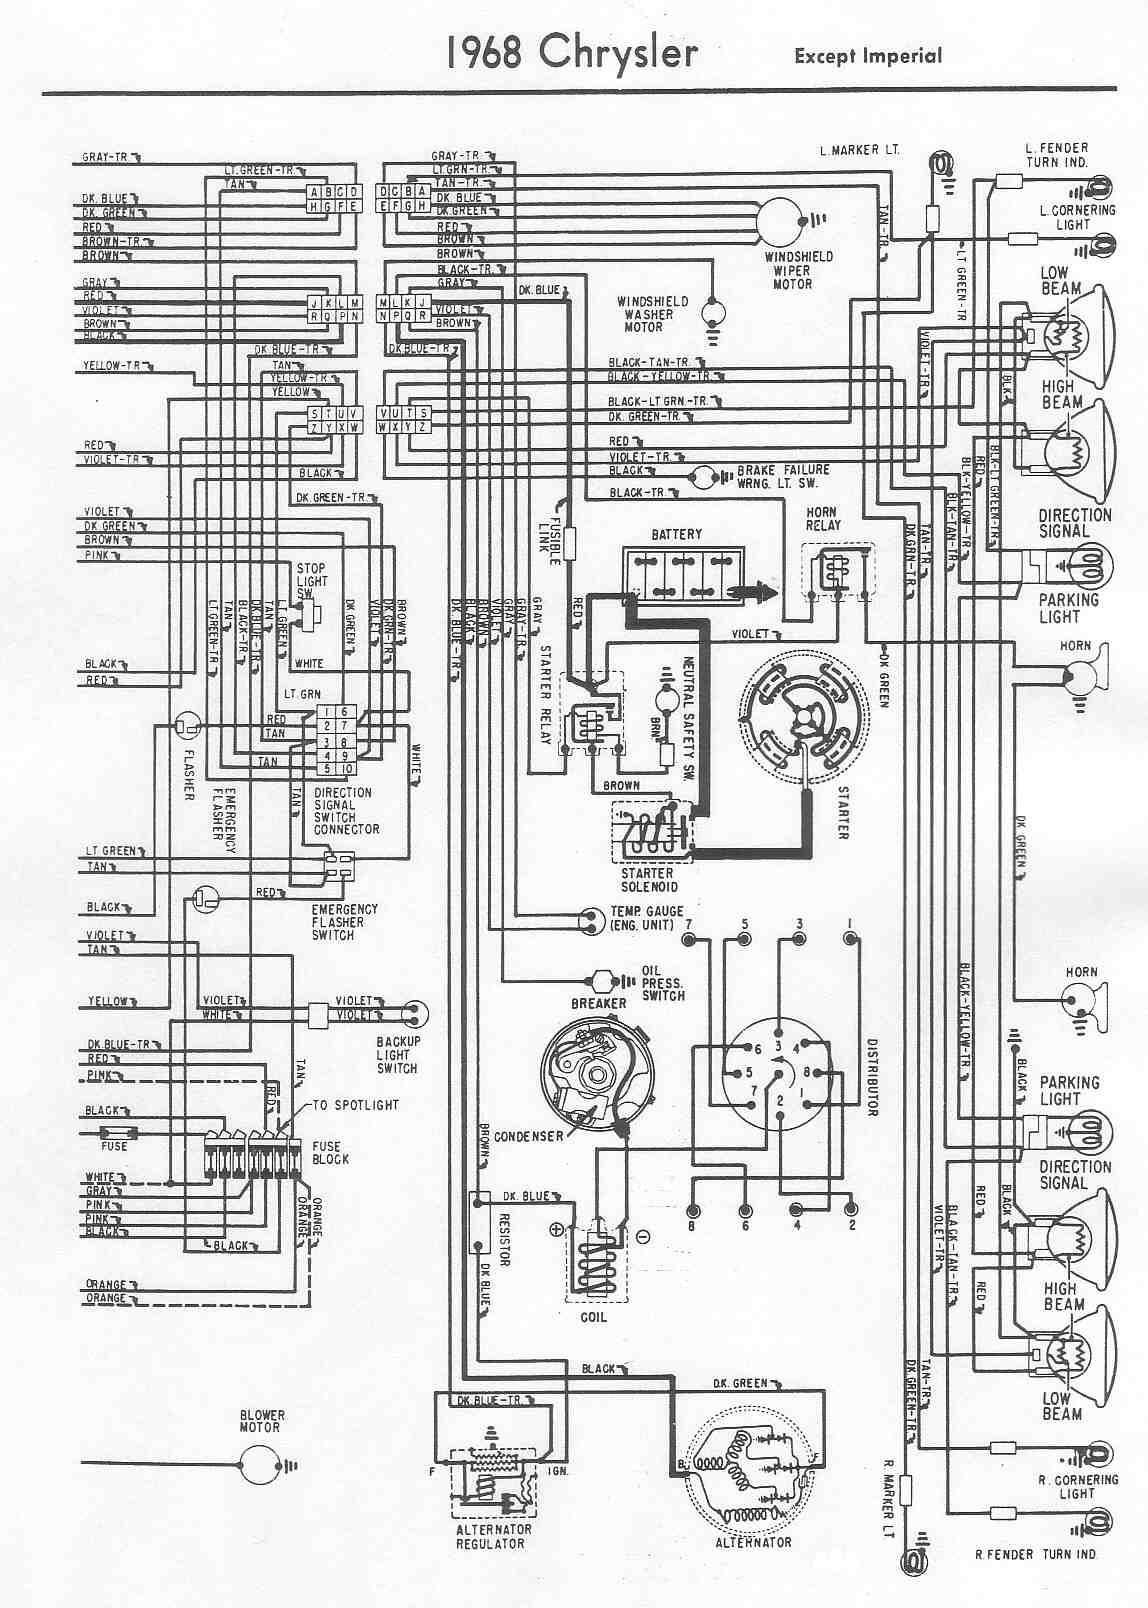 wiring diagram in addition 1972 chevy c10 wiring diagram on 68 1969 pontiac gto wiring diagram 68 gto dash wiring diagram [ 1148 x 1608 Pixel ]